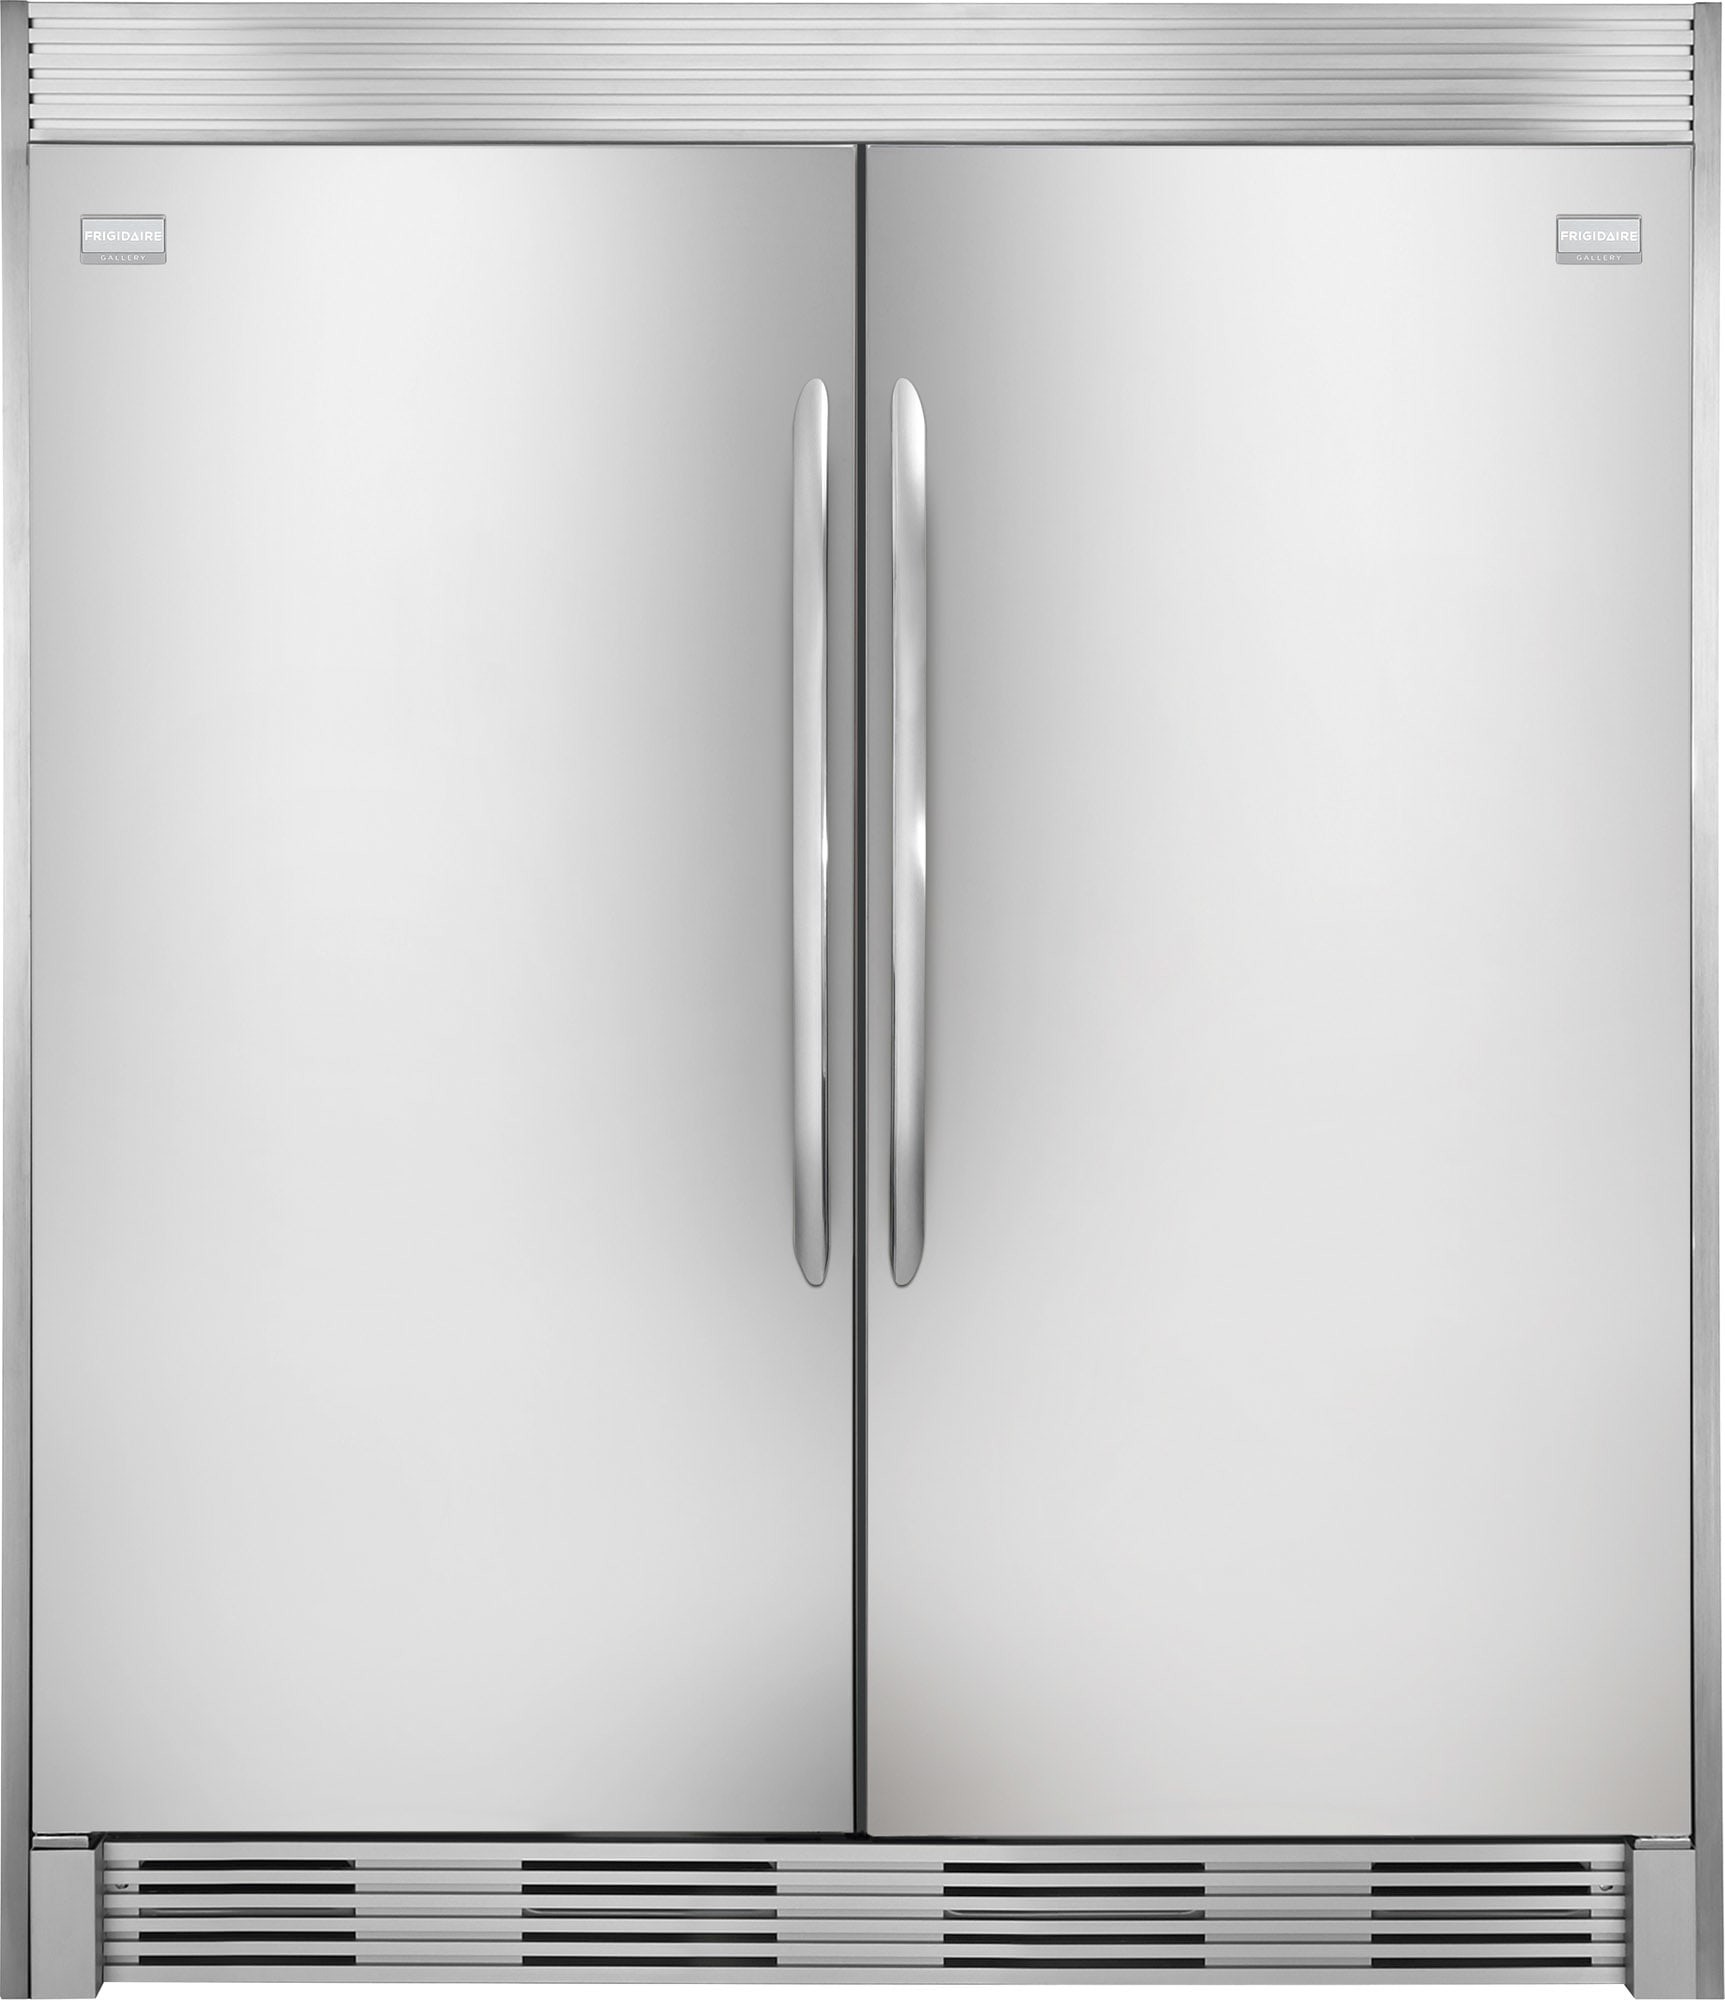 Frigidaire Frrefr1 Side By Side Column Refrigerator Freezer Set With 32 Inch Refrigerator And Stainless Refrigerator Frigidaire Gallery Refrigerator Freezer